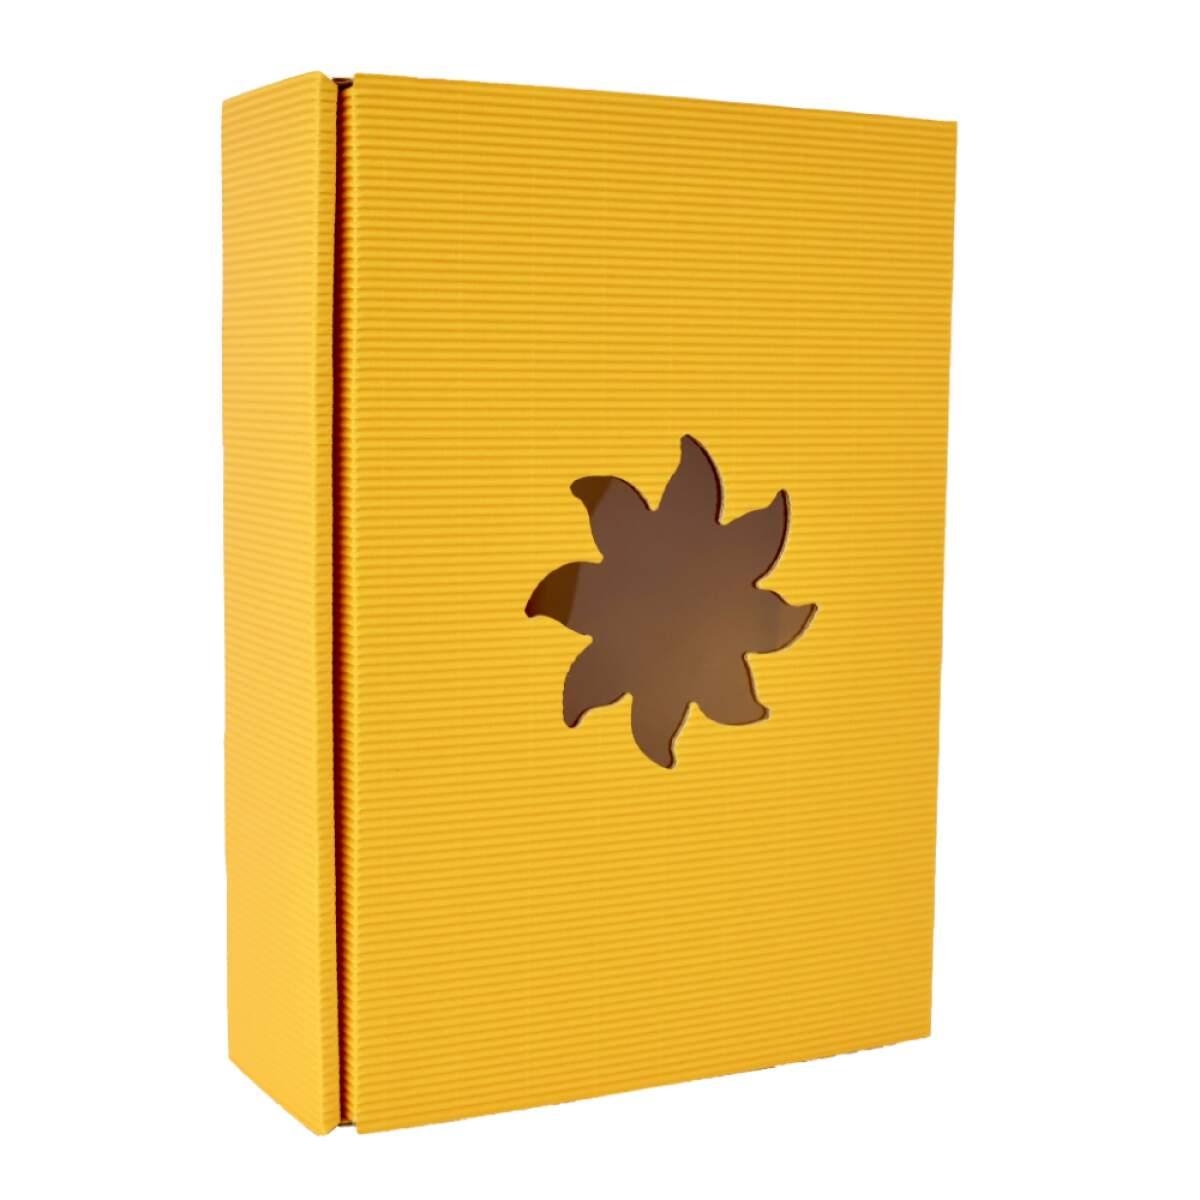 Box-Gr-L-Sonne-gelb_2122_1000px